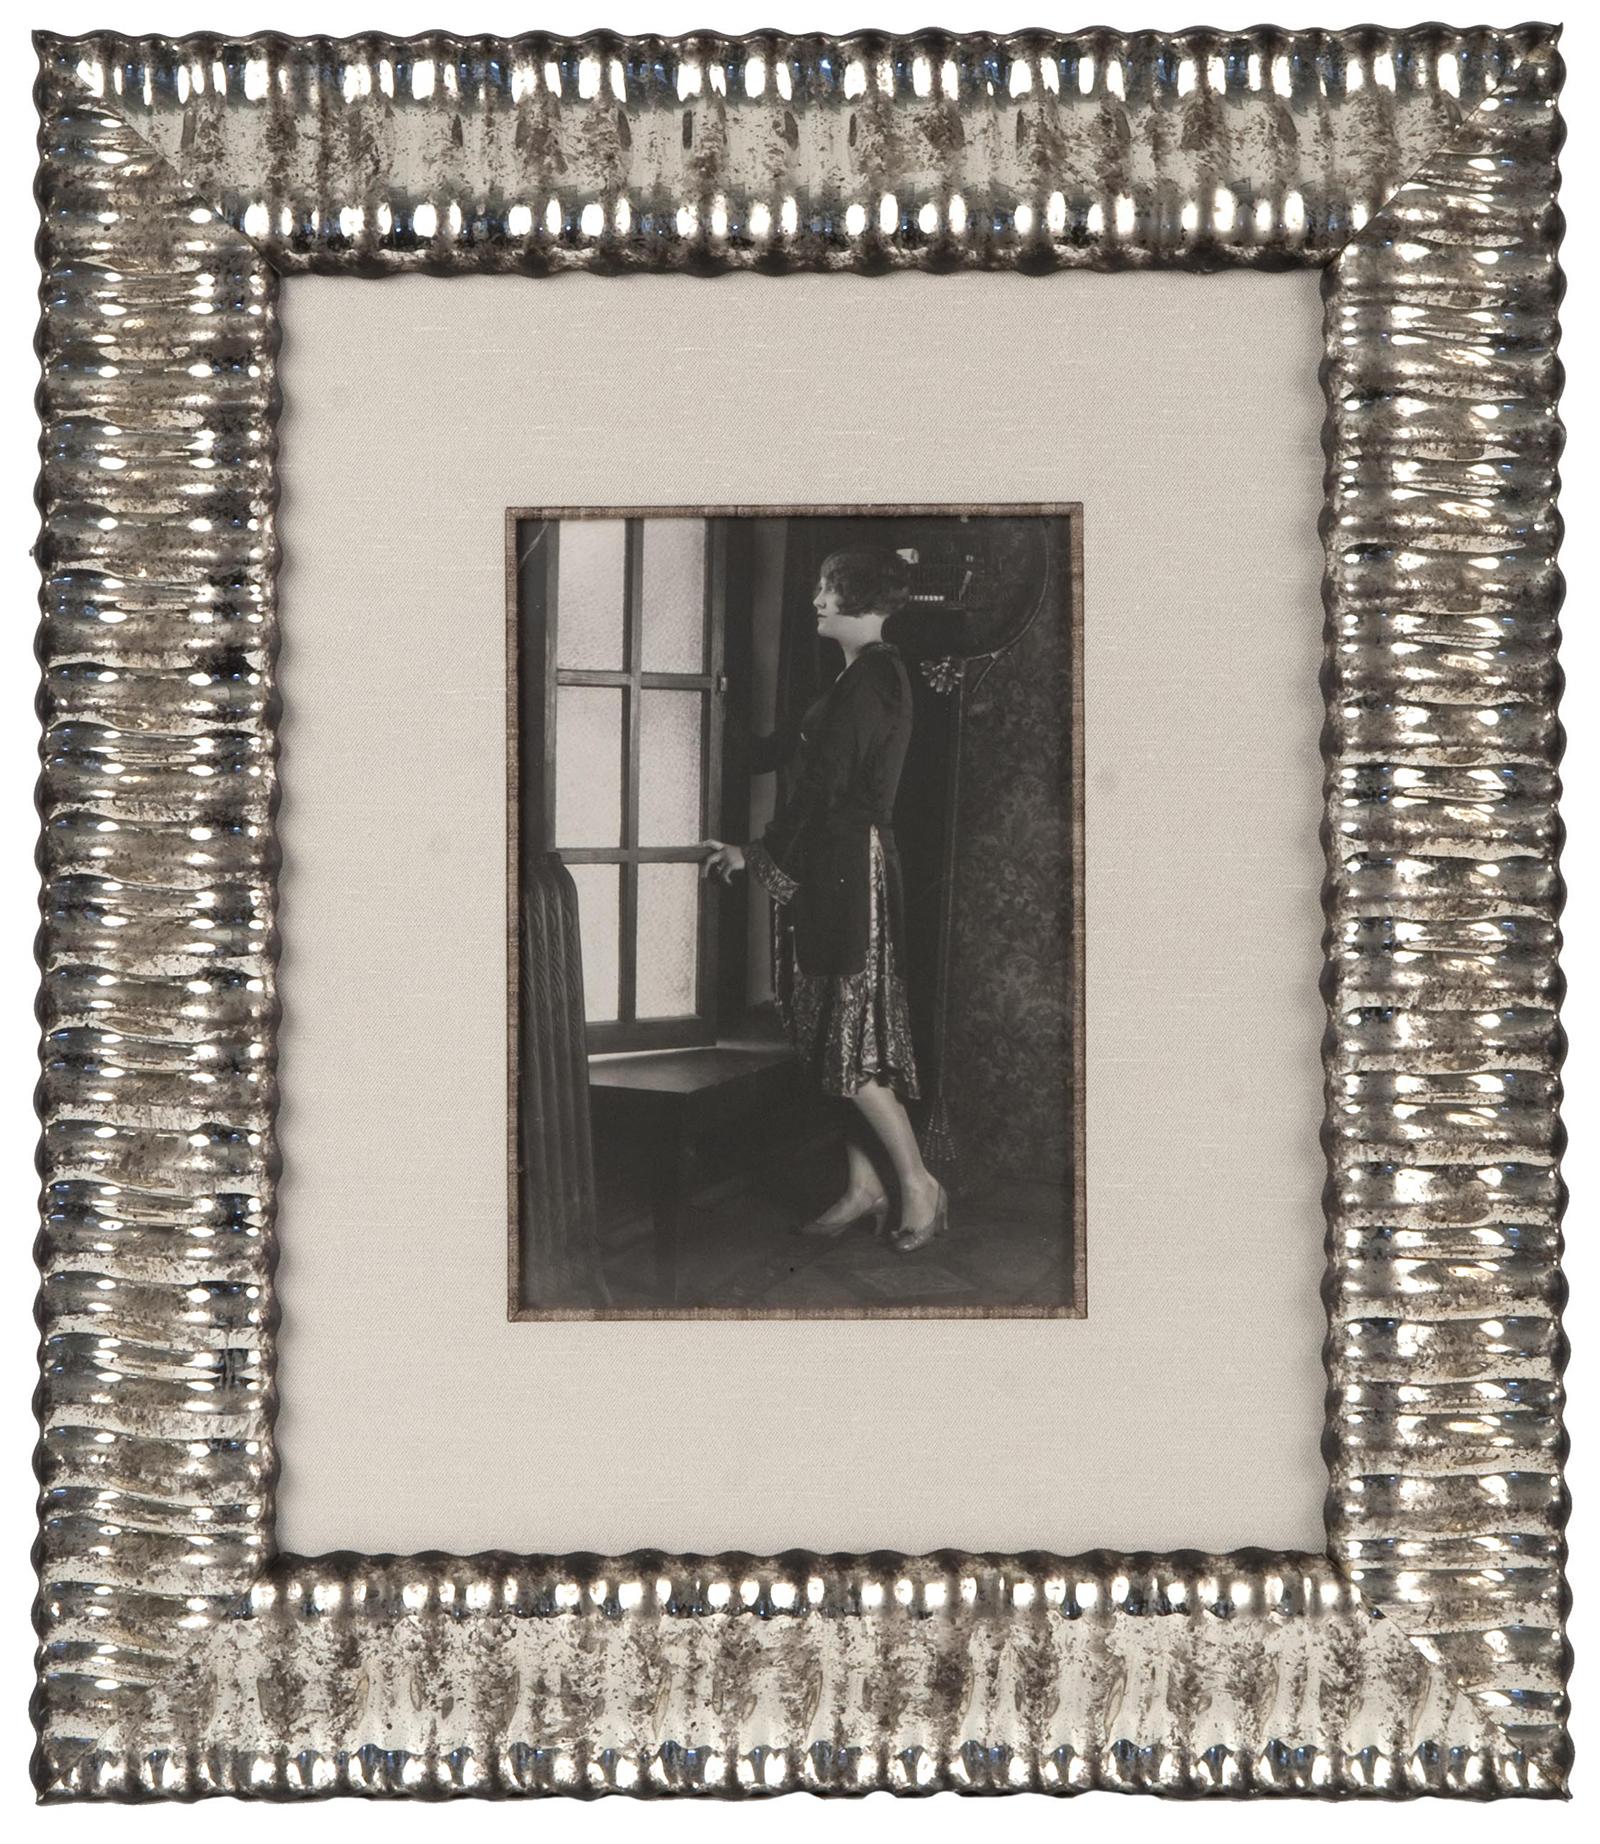 Rippled Silver Frame